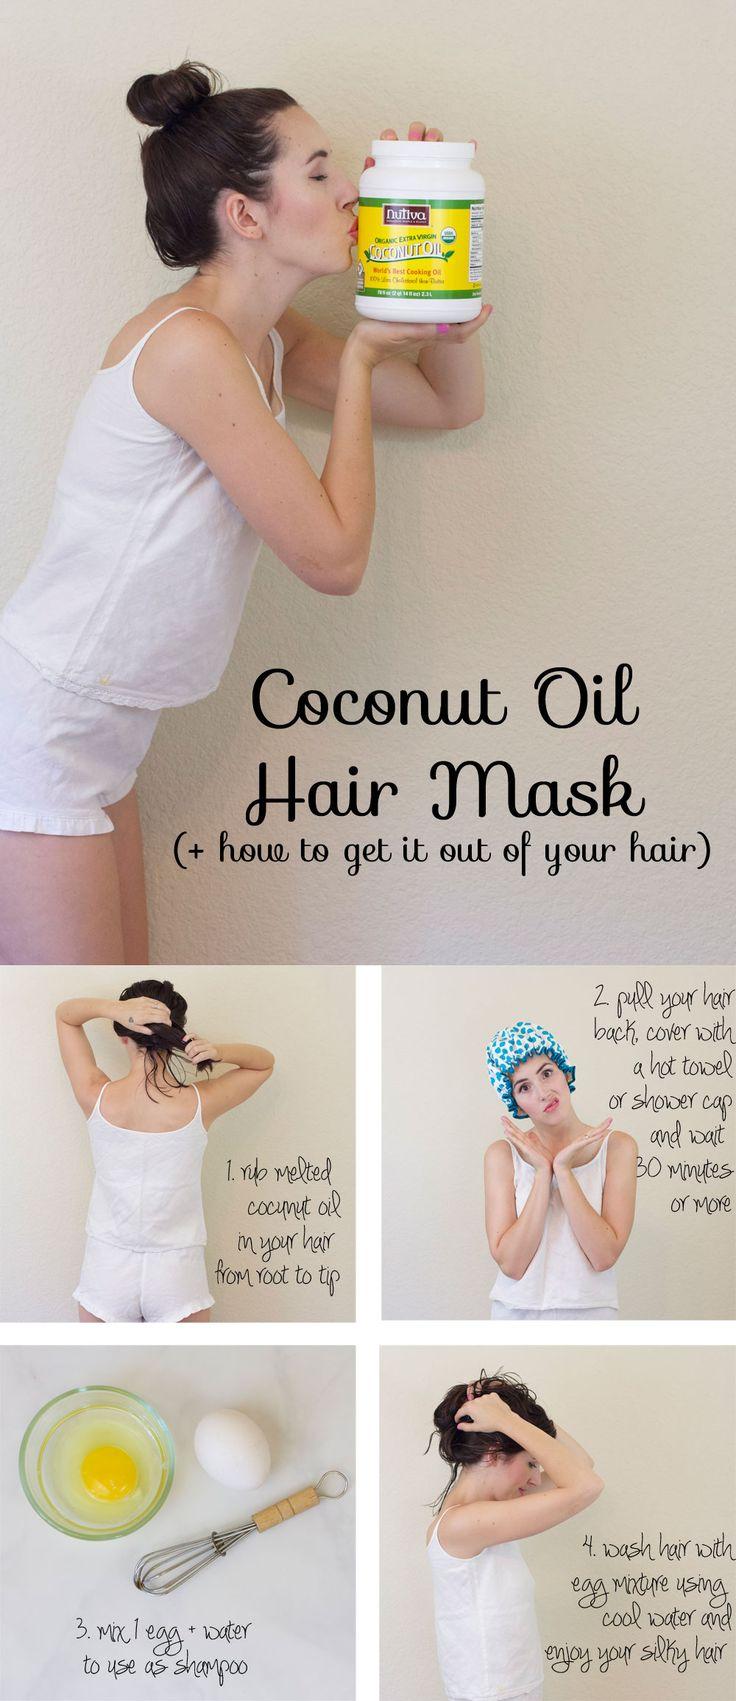 11 Coconut Oil Hair Mask